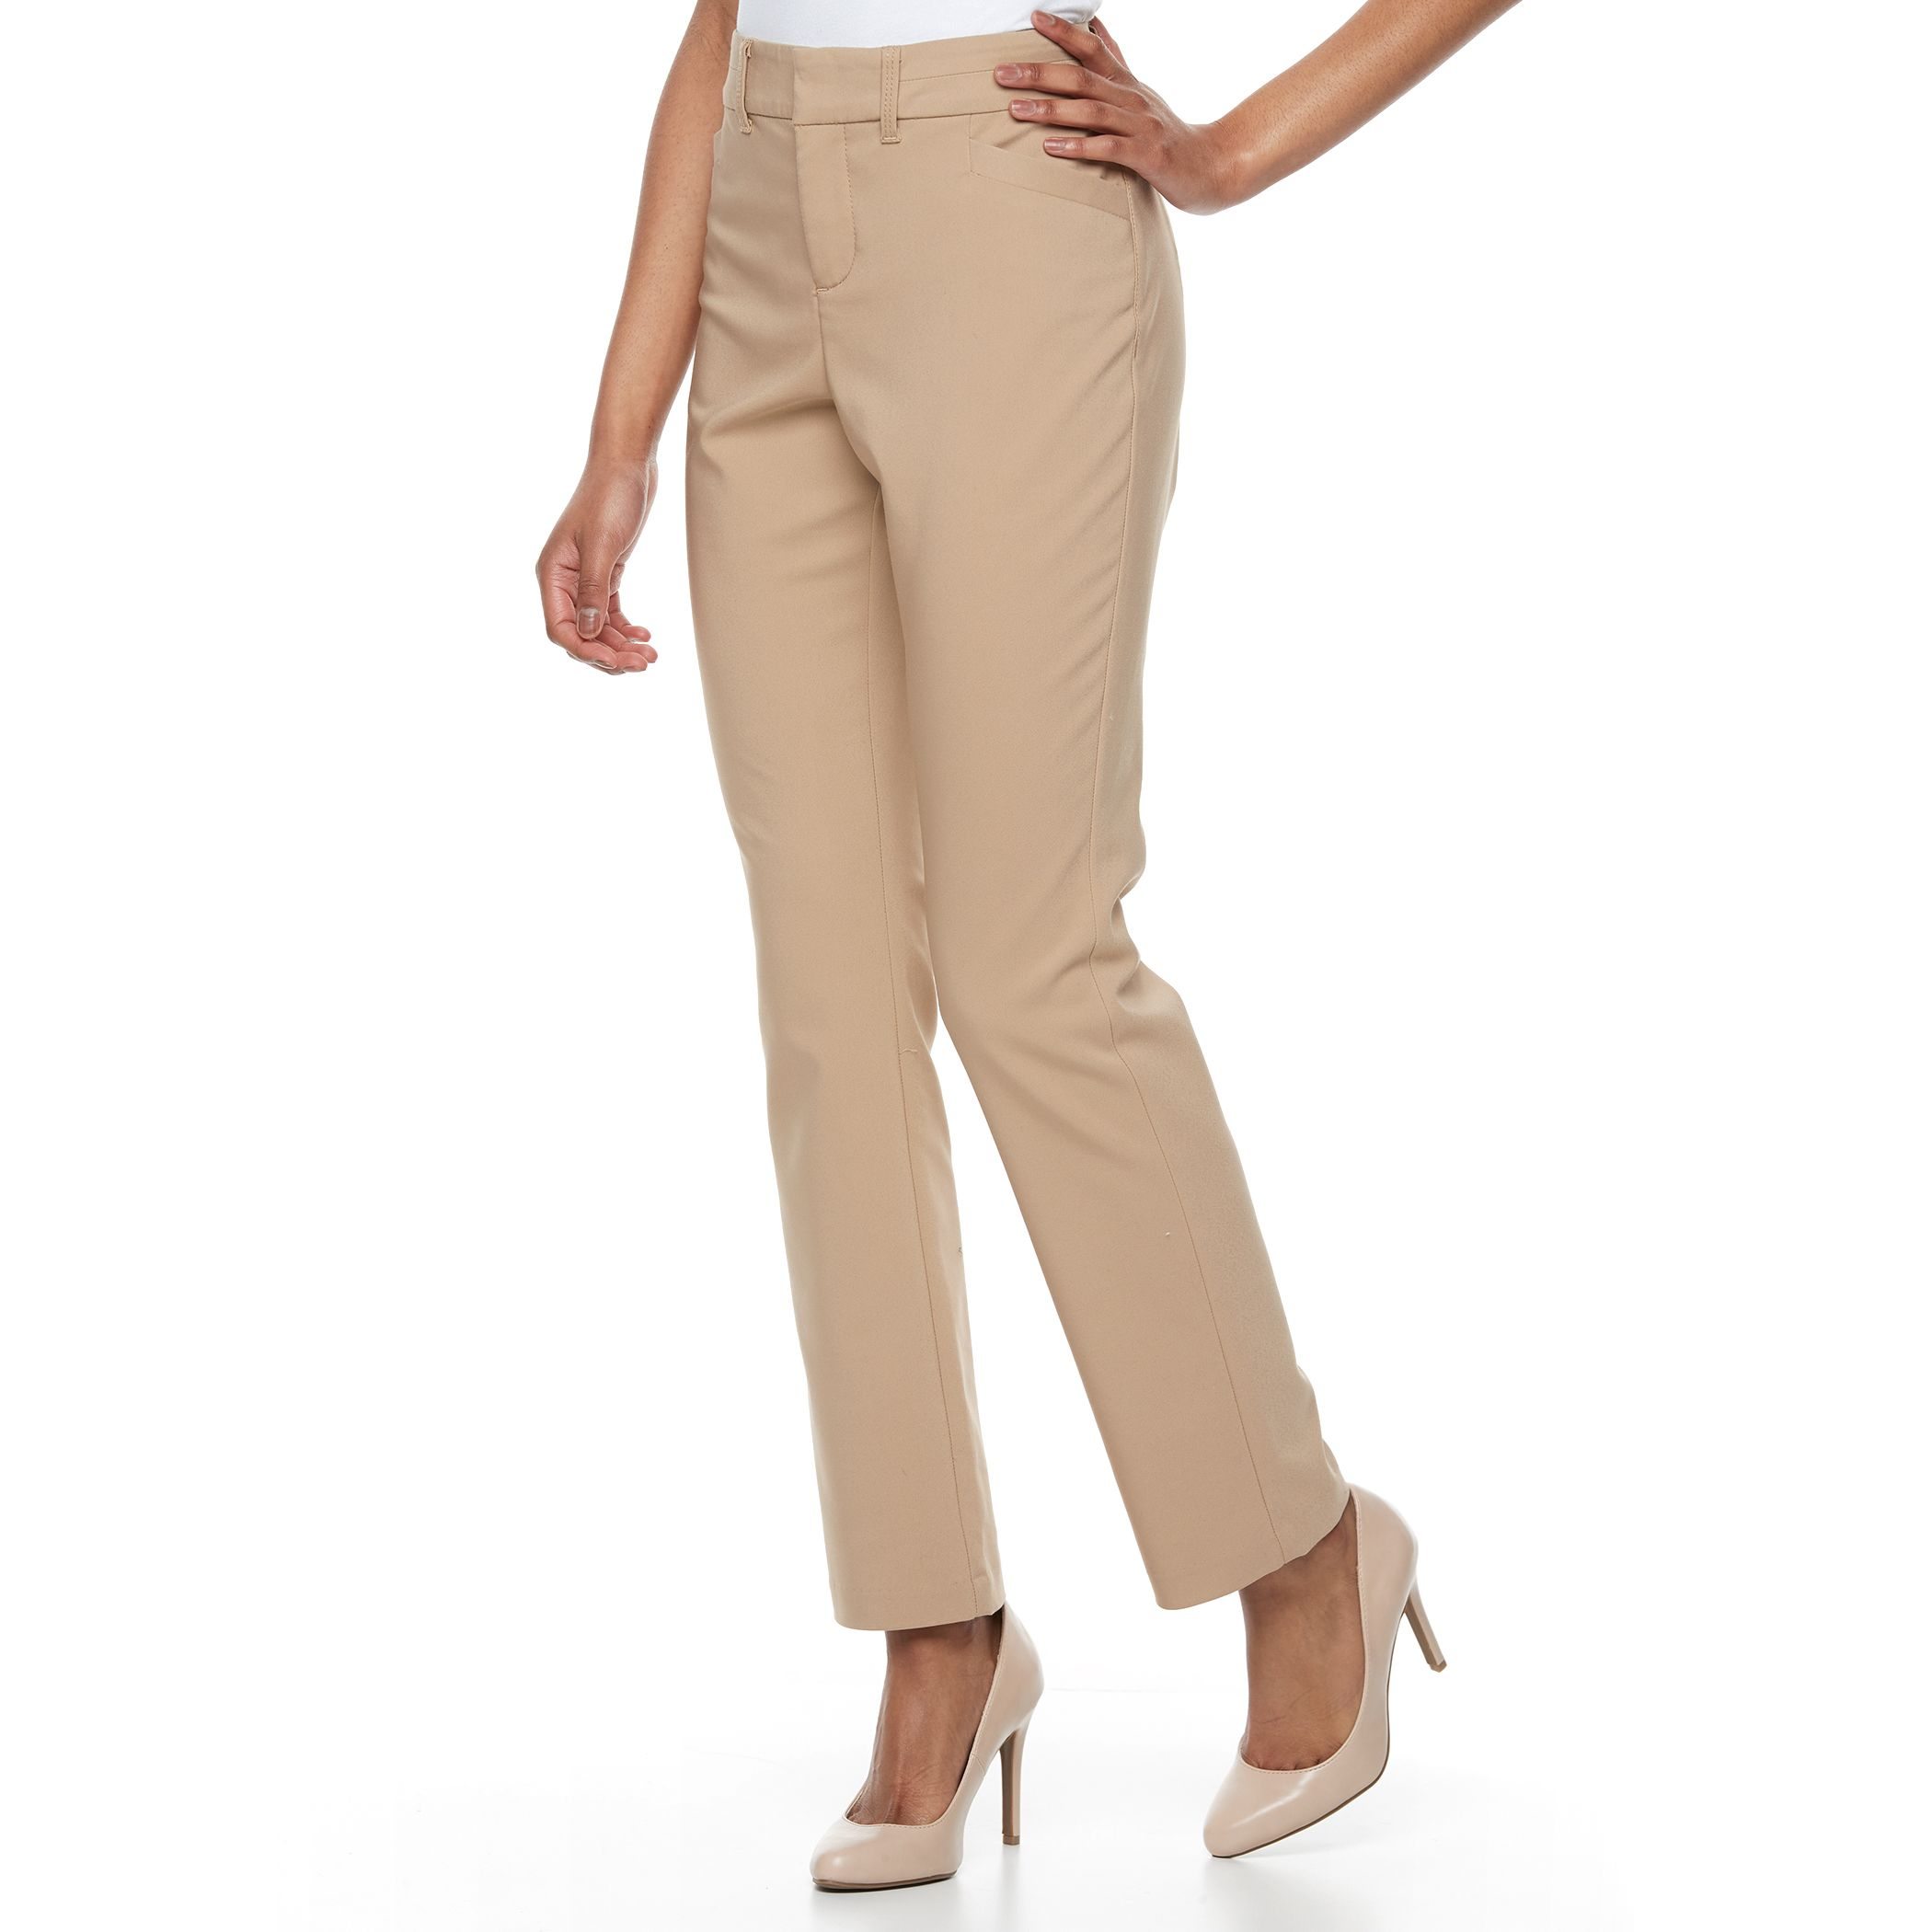 Womens Khaki Dress Pants u5y8Lms0